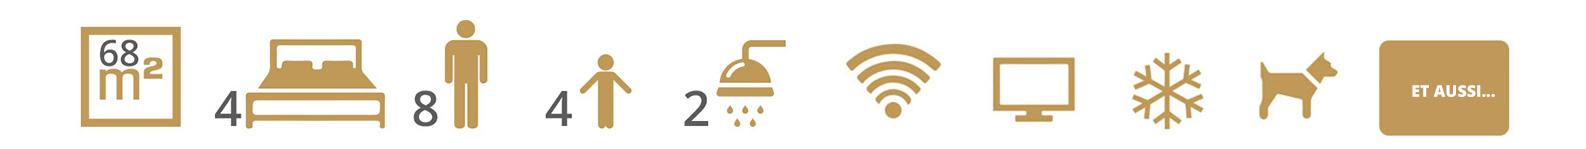 Icones des services inclus avec la location Super Cosy